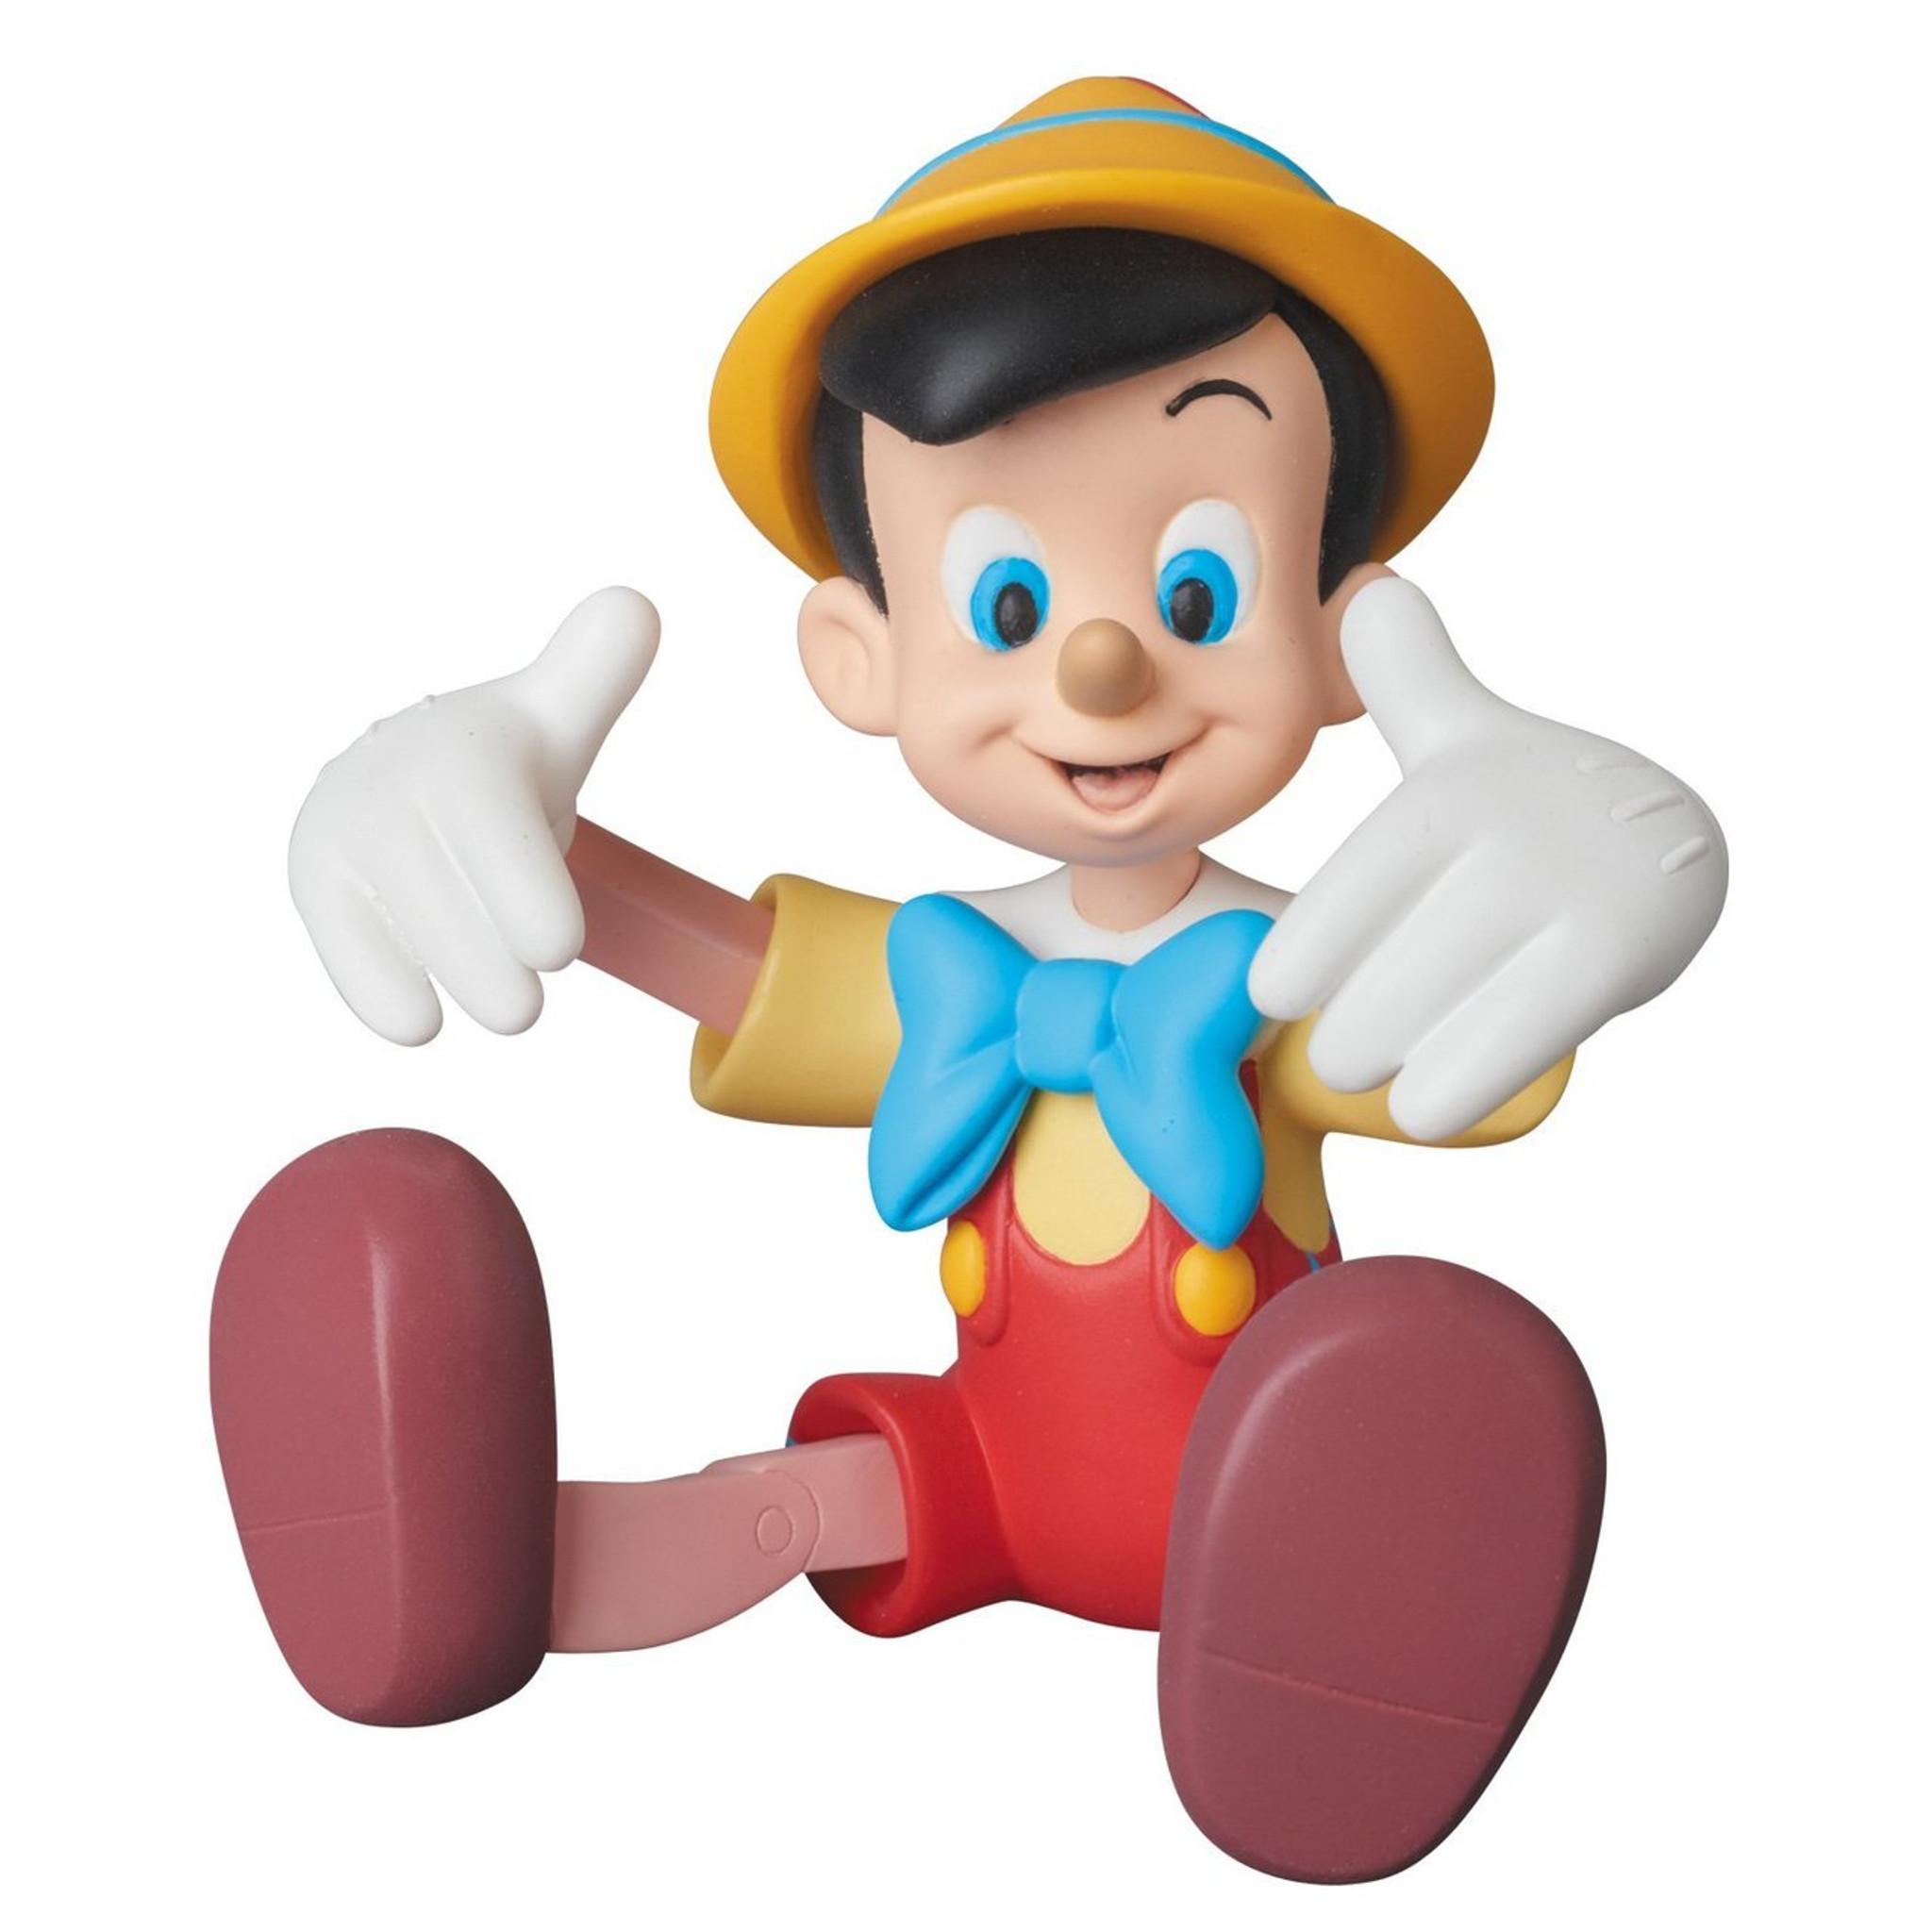 Medicom UDF-354 Ultra Detail Figure Disney Pinocchio